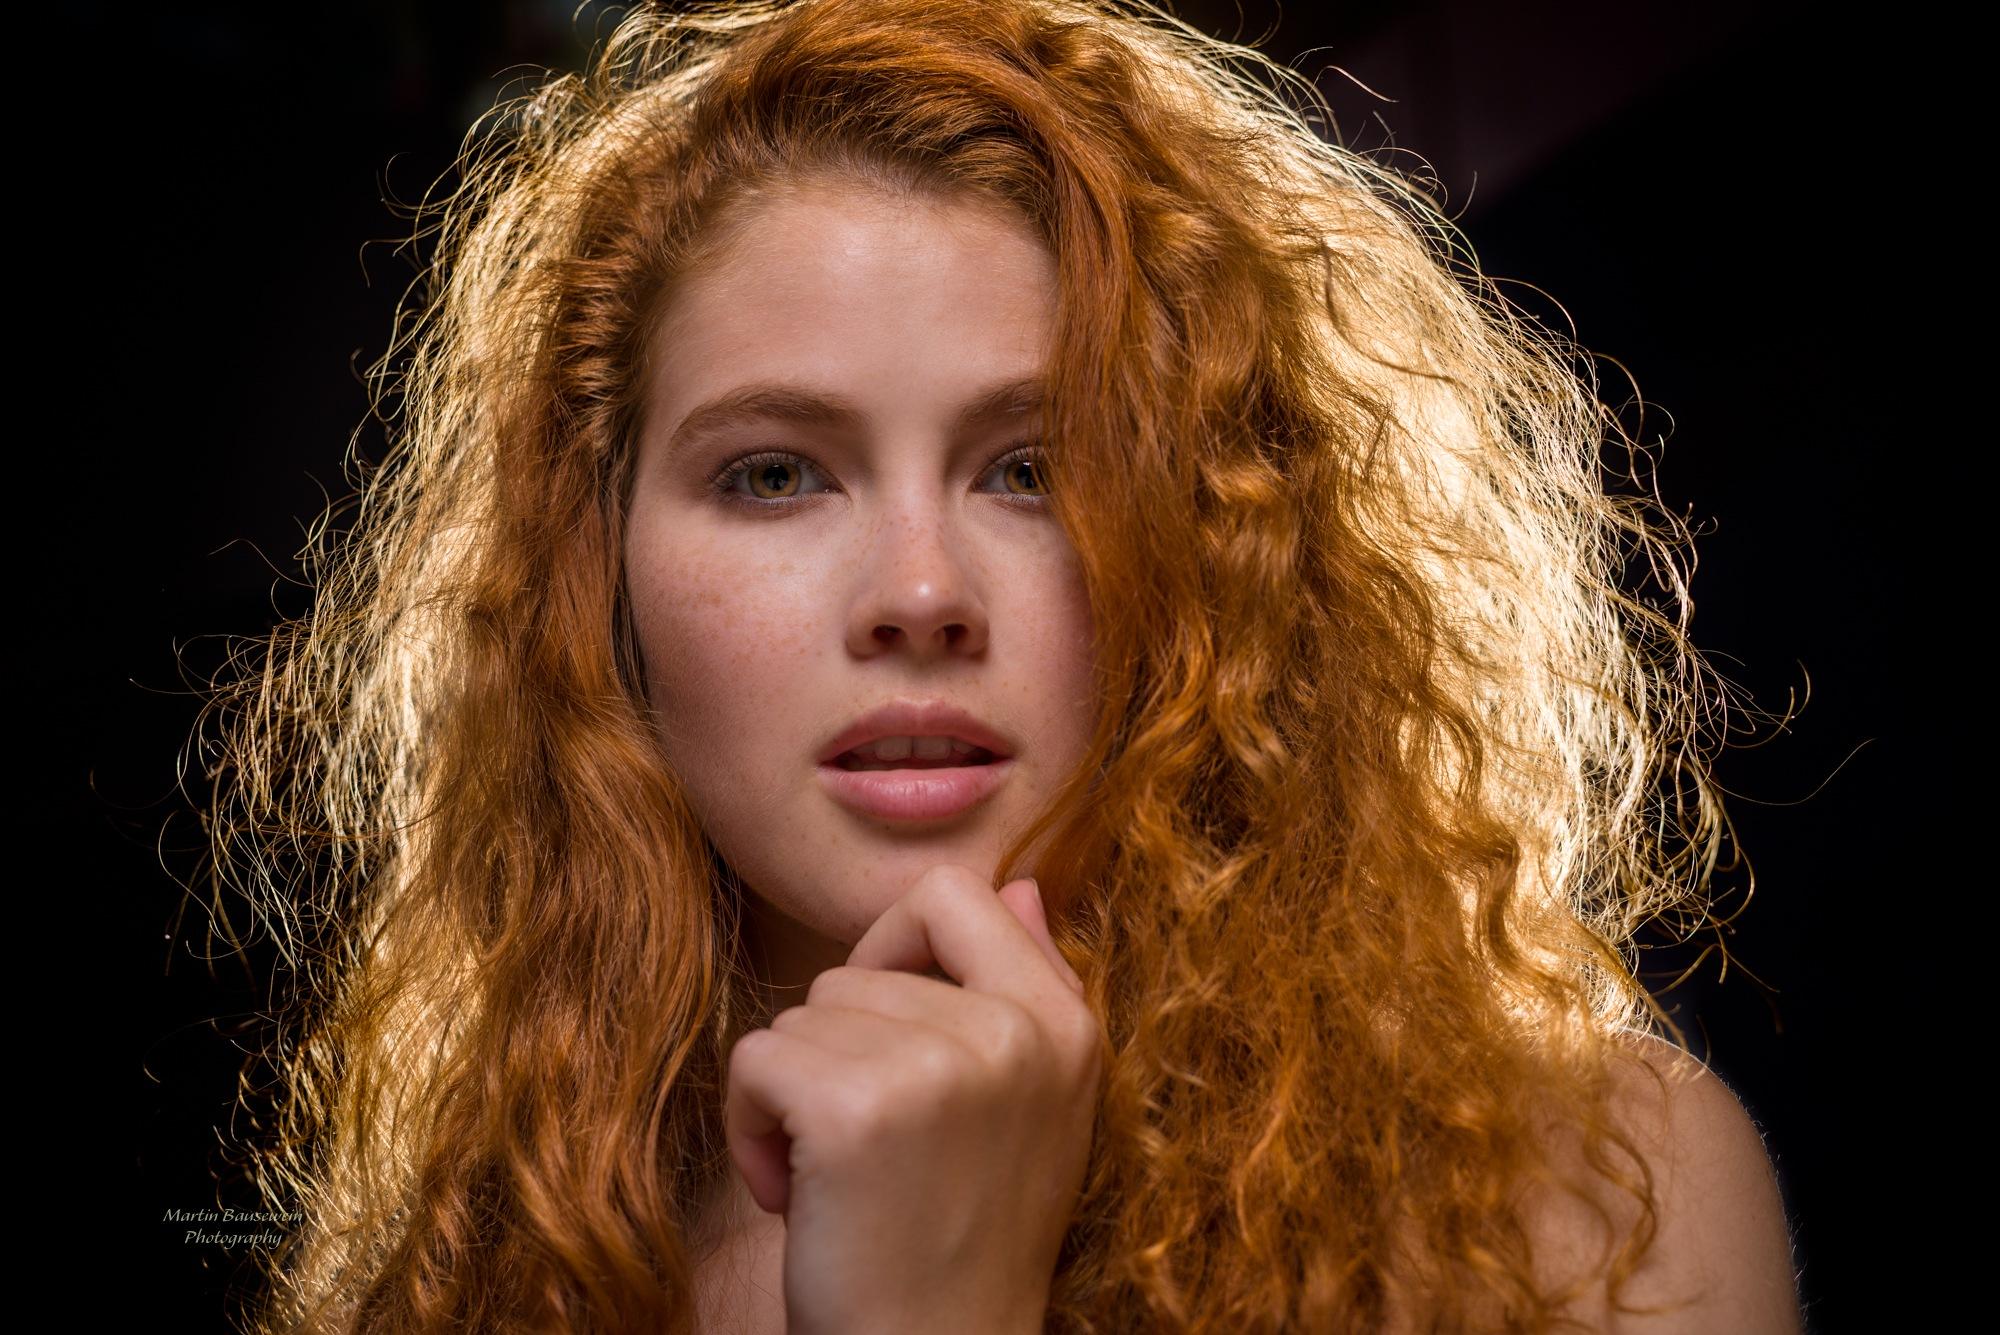 redhead by Martin Bausewein